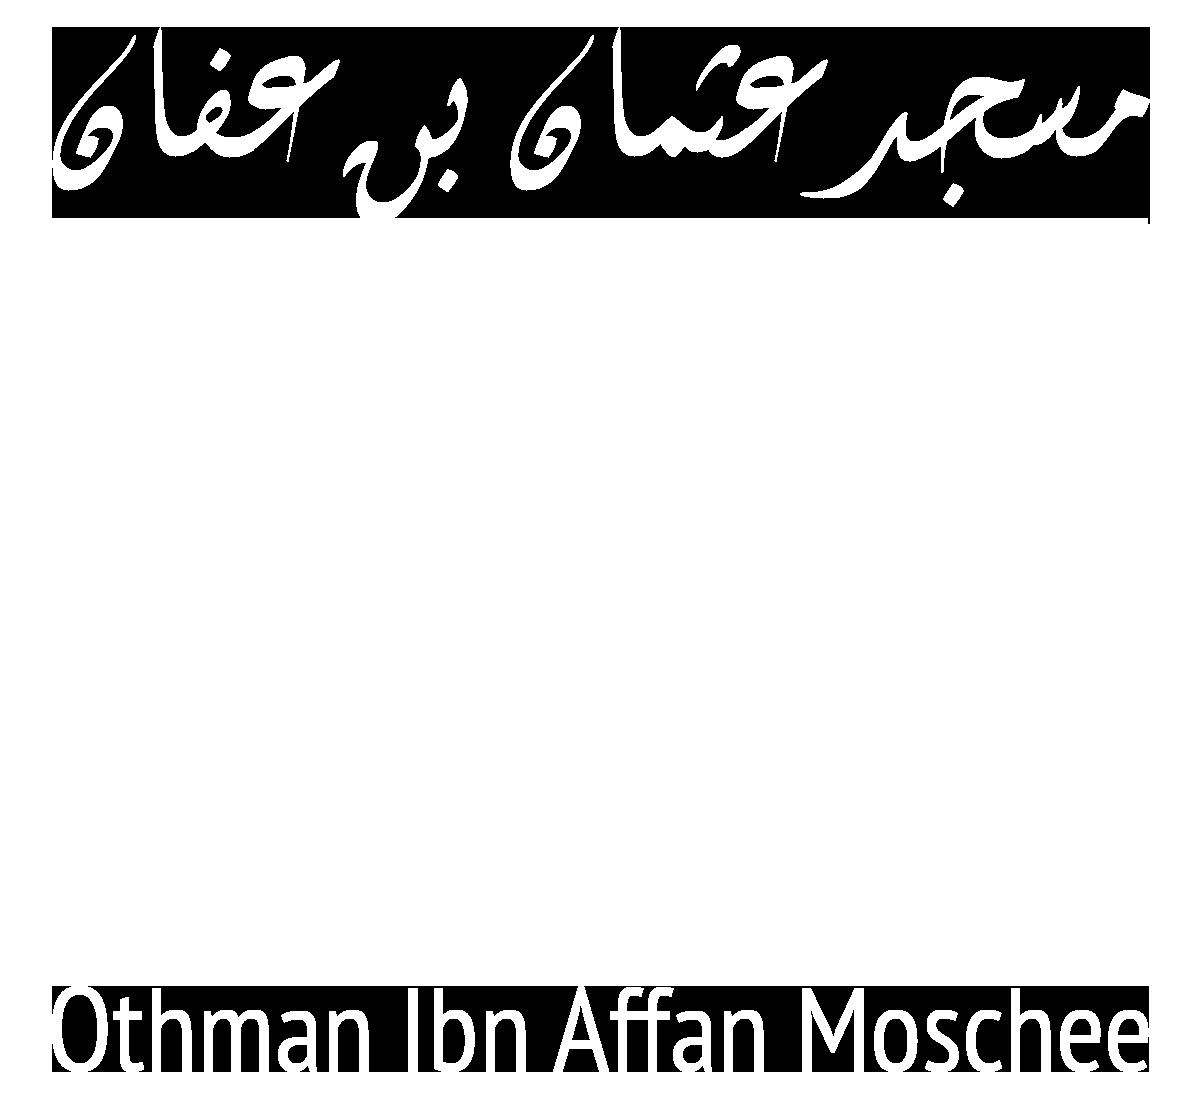 Othman Ibn Affan Moschee Logo Transparent